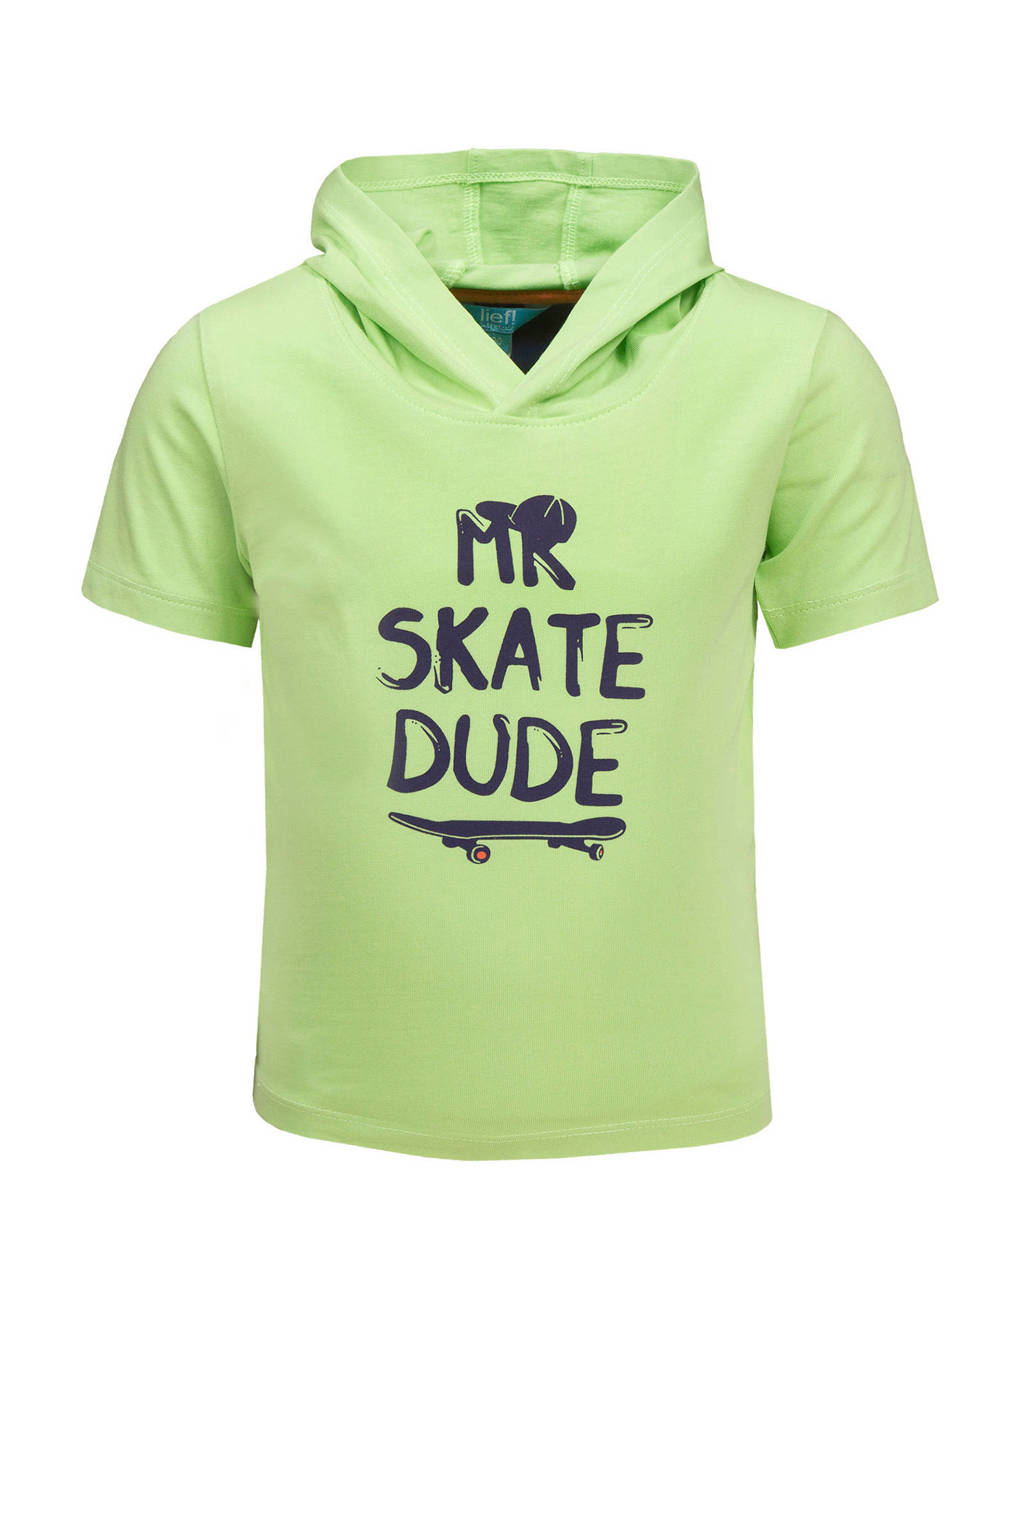 lief! T-shirt met printopdruk jade lime green